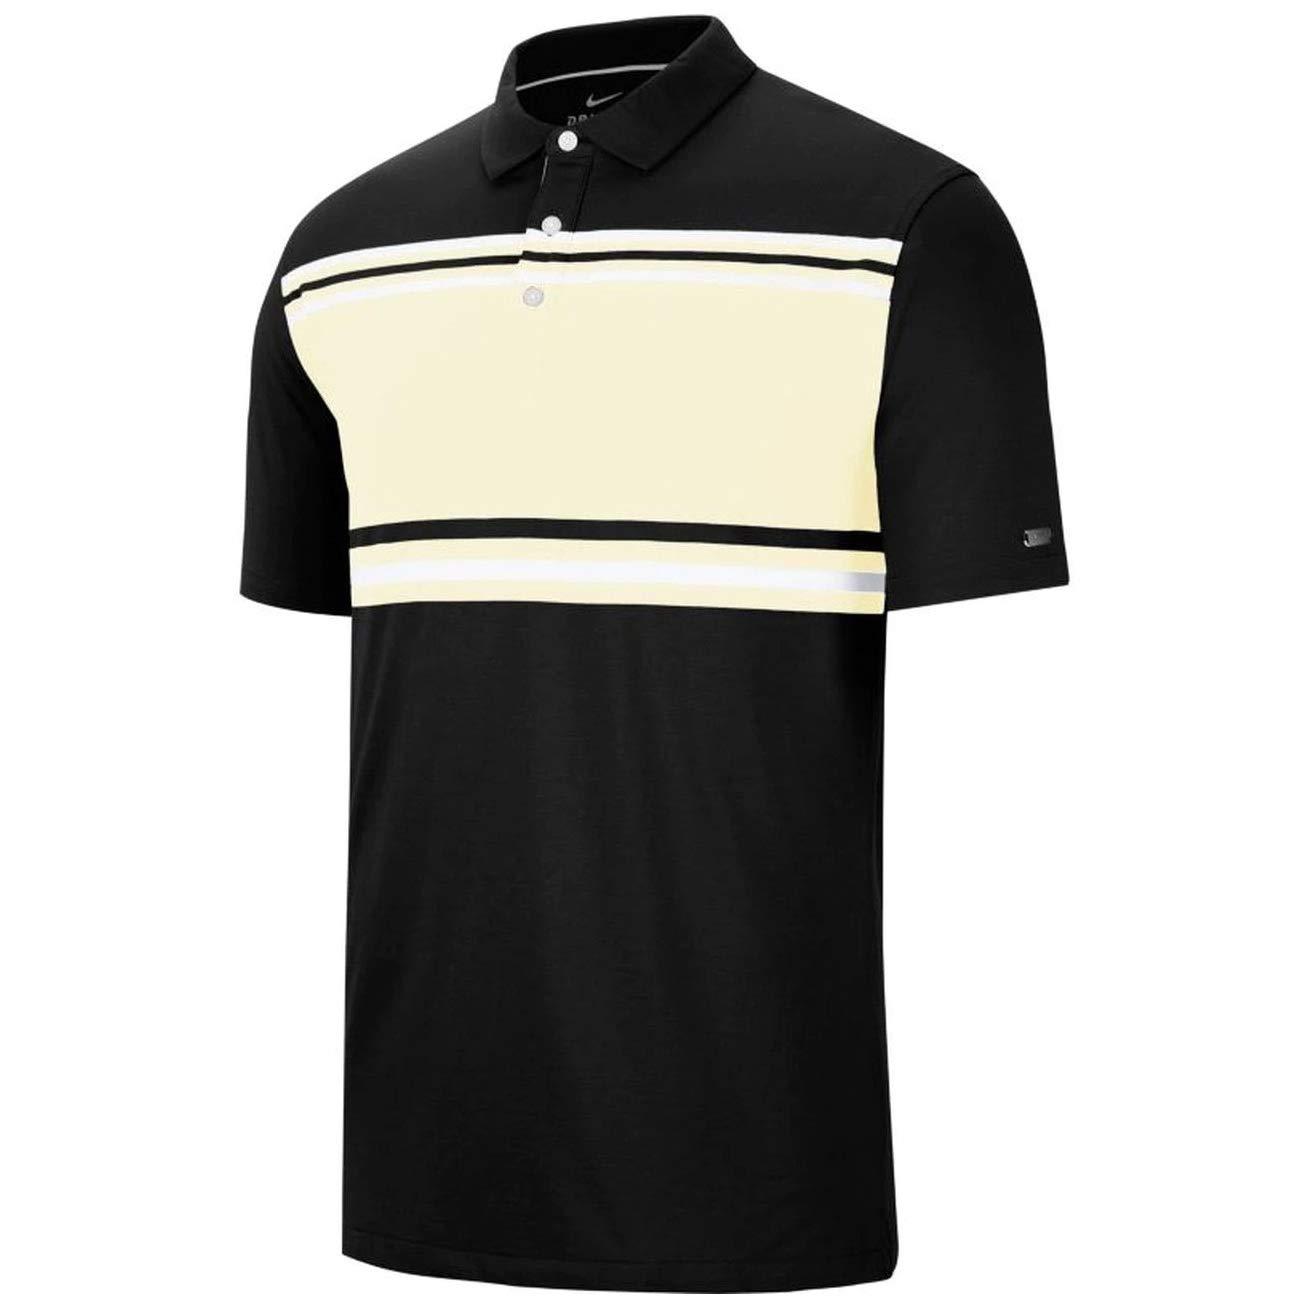 Nike Dri Fit Player Golf Polo 2020 - BV0470-010, S, Negro/Vela ...